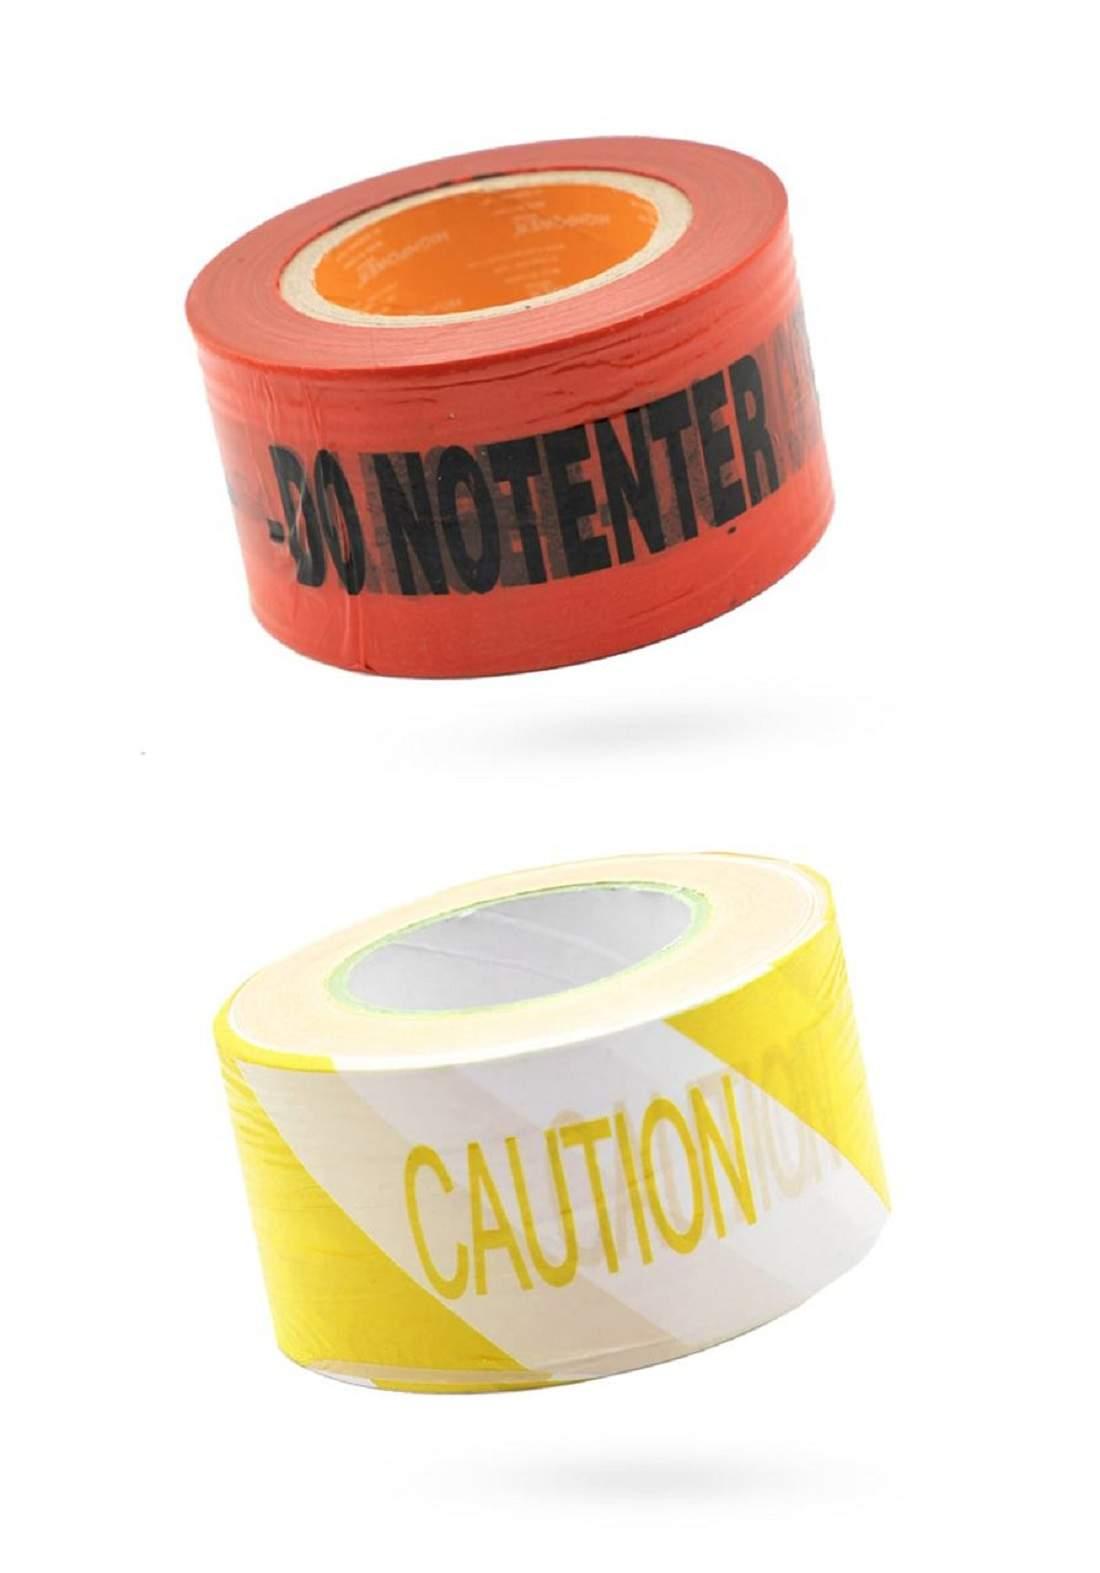 Subul Alhurra Warning Safety Caution Tape 300 m شريط تحذير